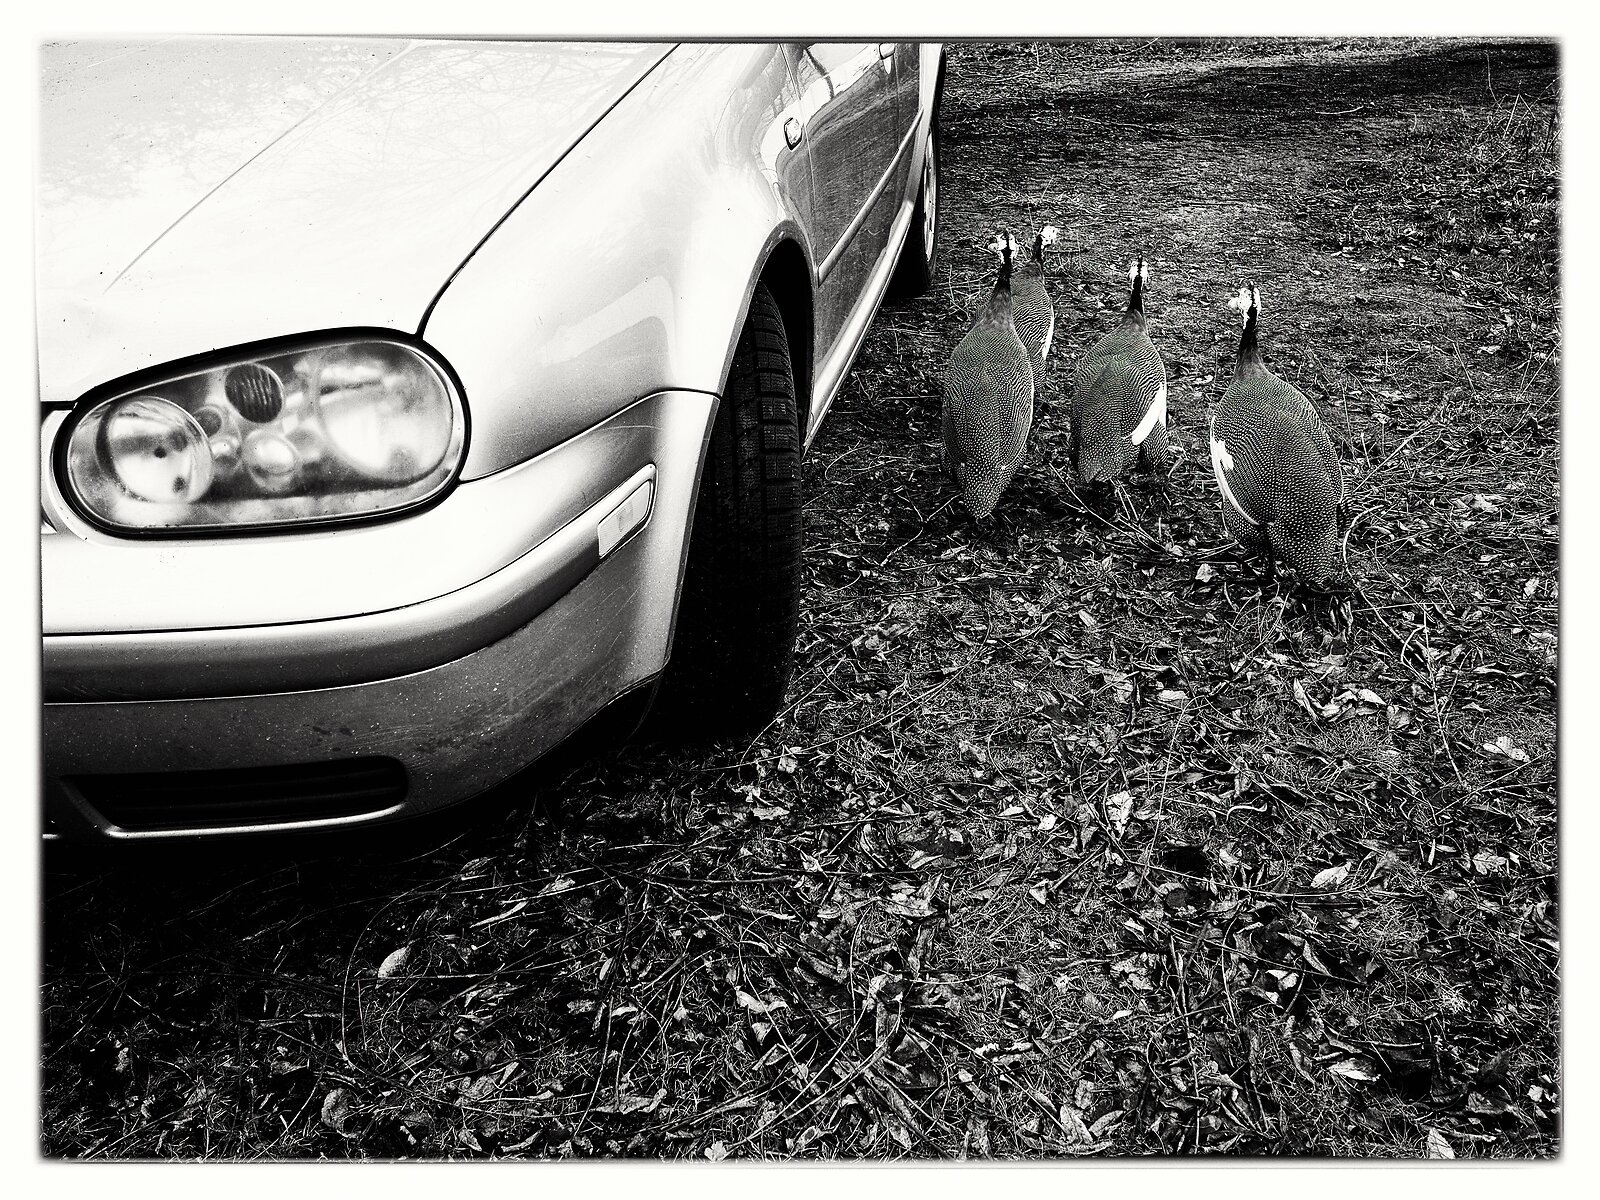 PenF_Jan8_21_guinea_hens+car.jpg